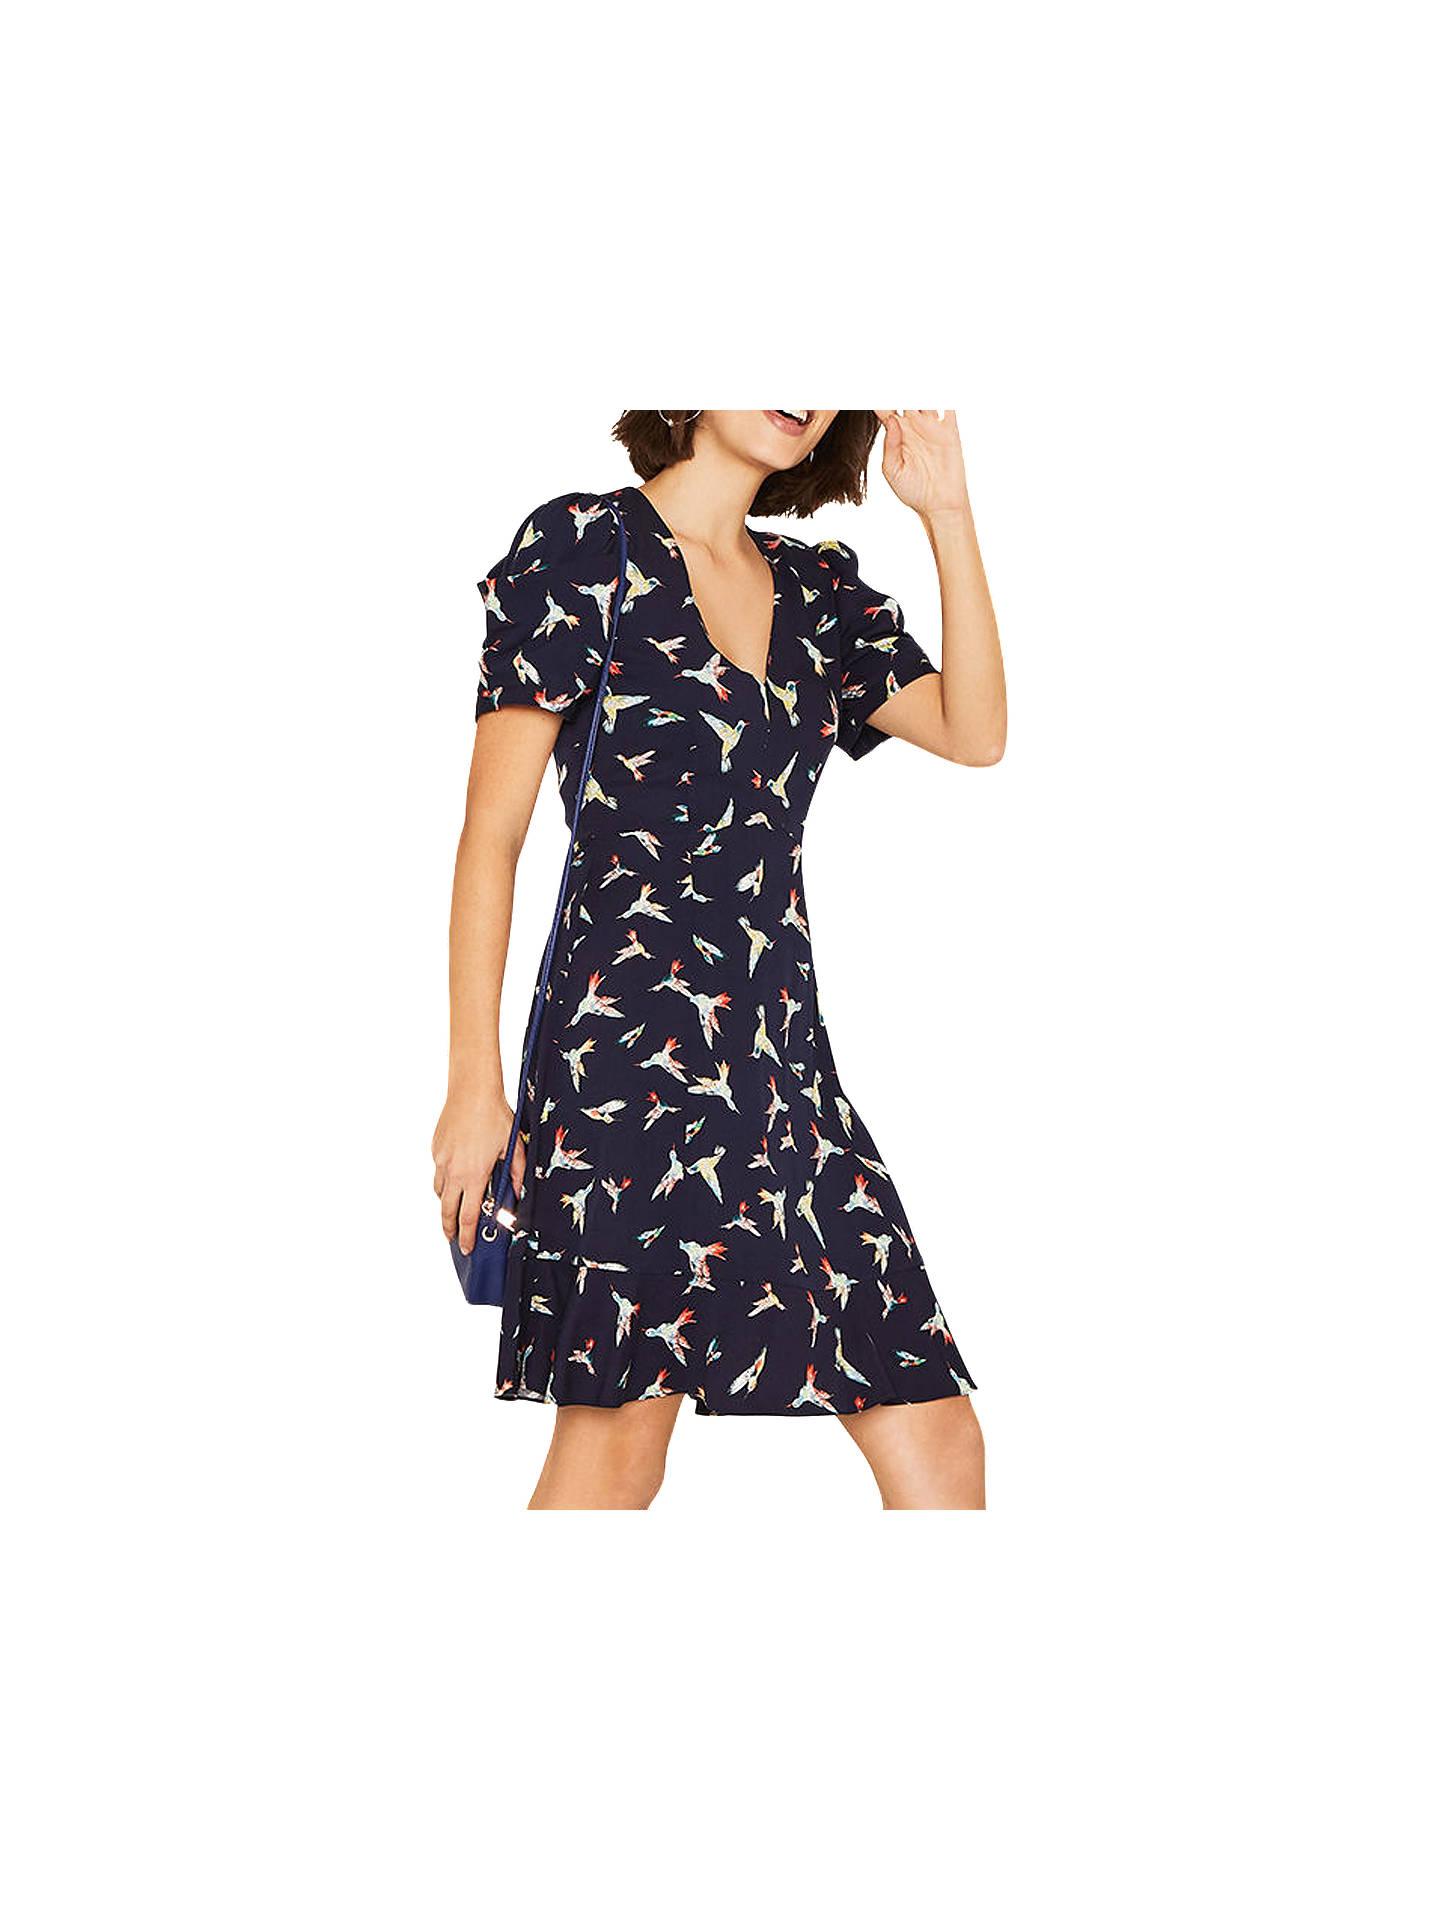 24213d974e94 Buy Oasis Bird V Neck Dress, Multi/Blue, 6 Online at johnlewis.